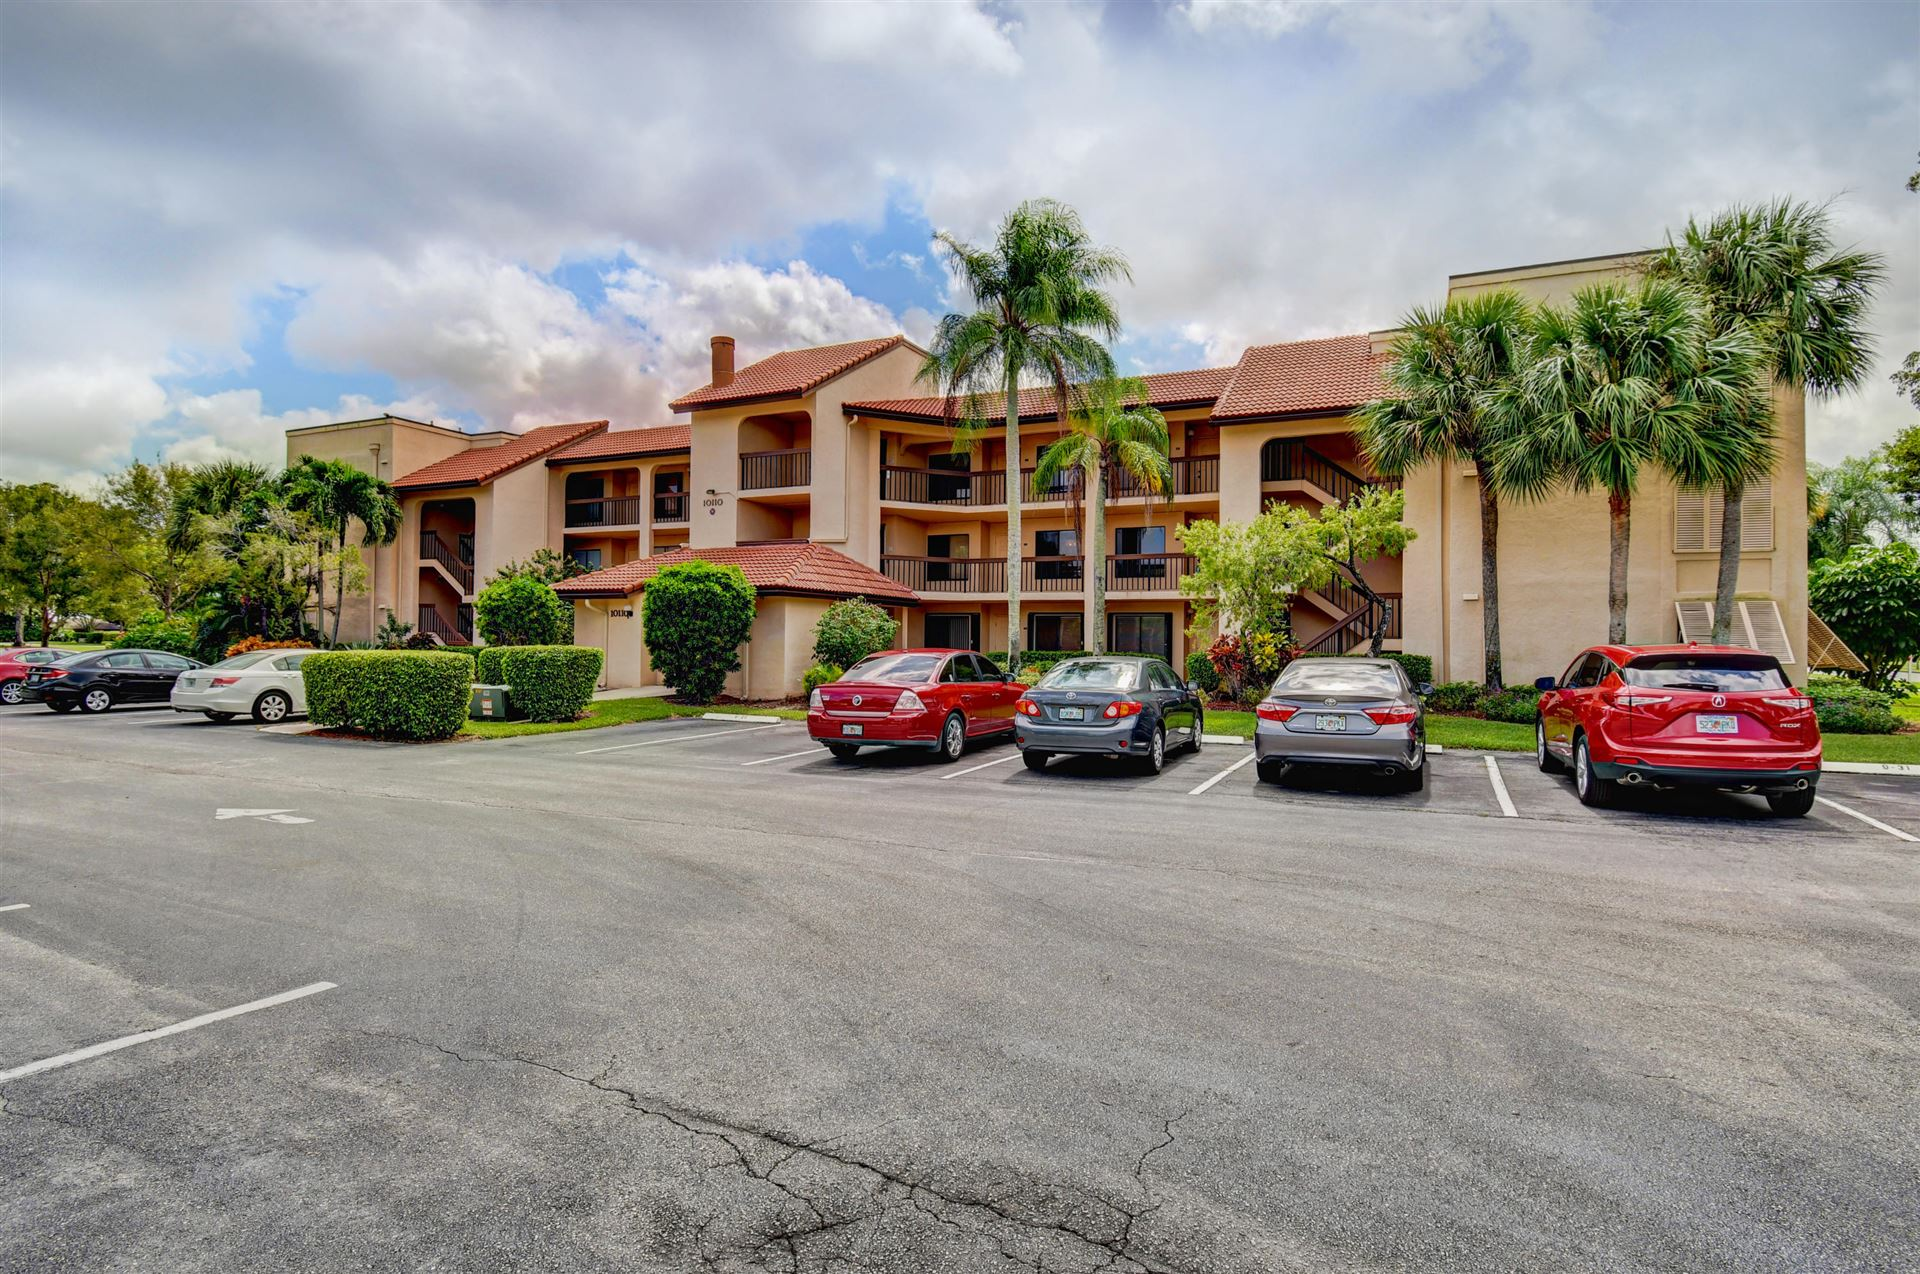 10110 Cedar Point Boulevard #203, Boynton Beach, FL 33437 - #: RX-10569976